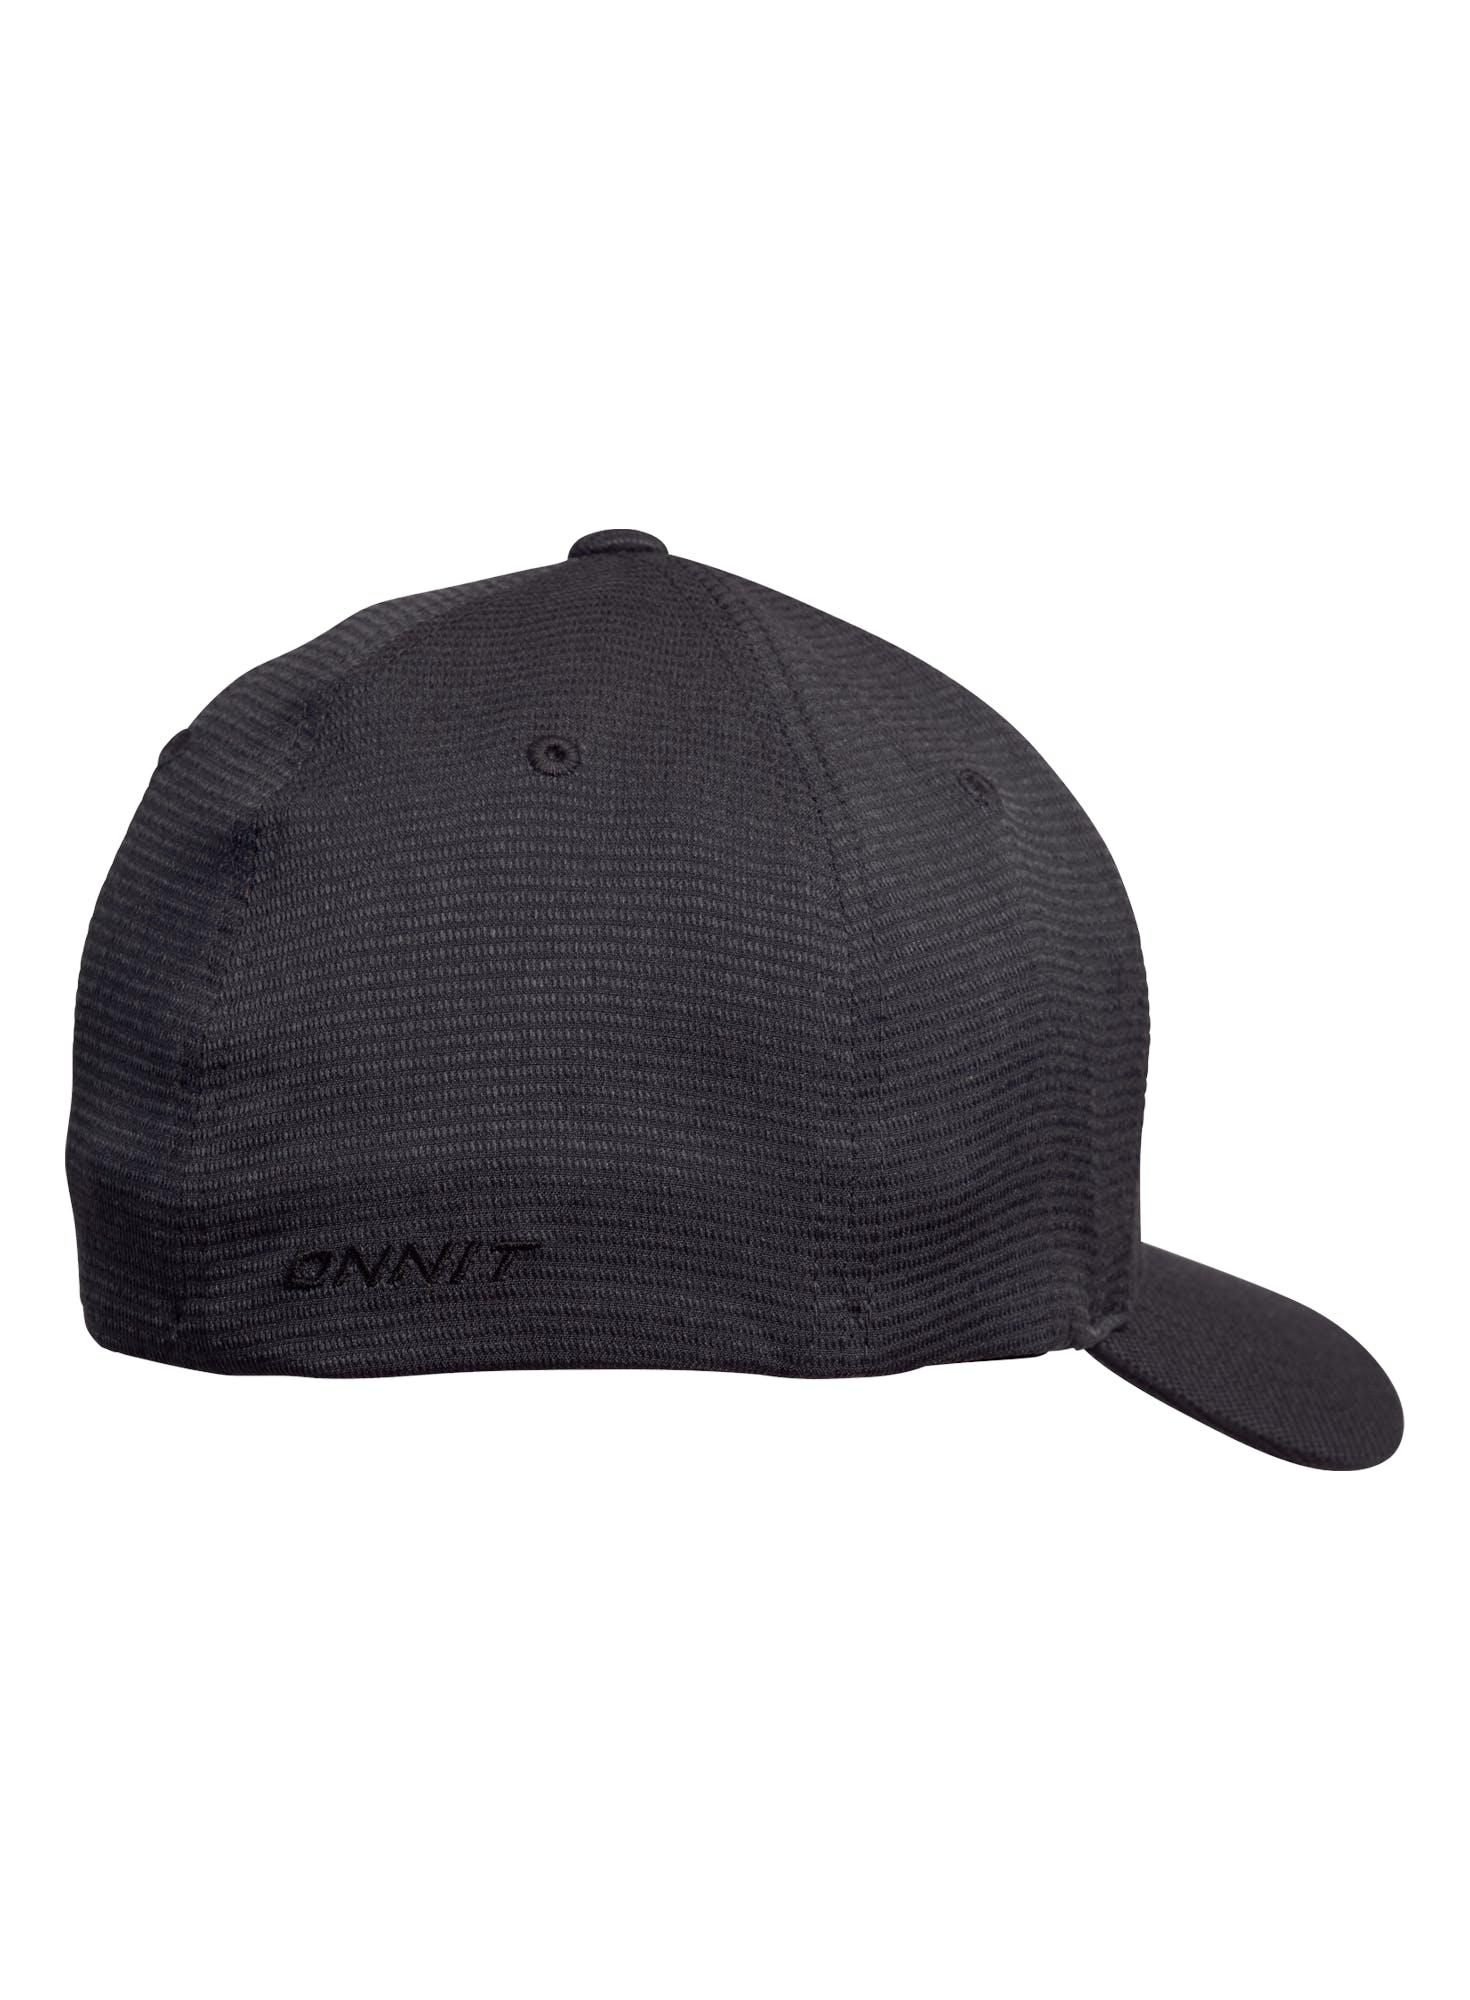 Helix Tech Knit Flexfit Ballcap Bonus Image